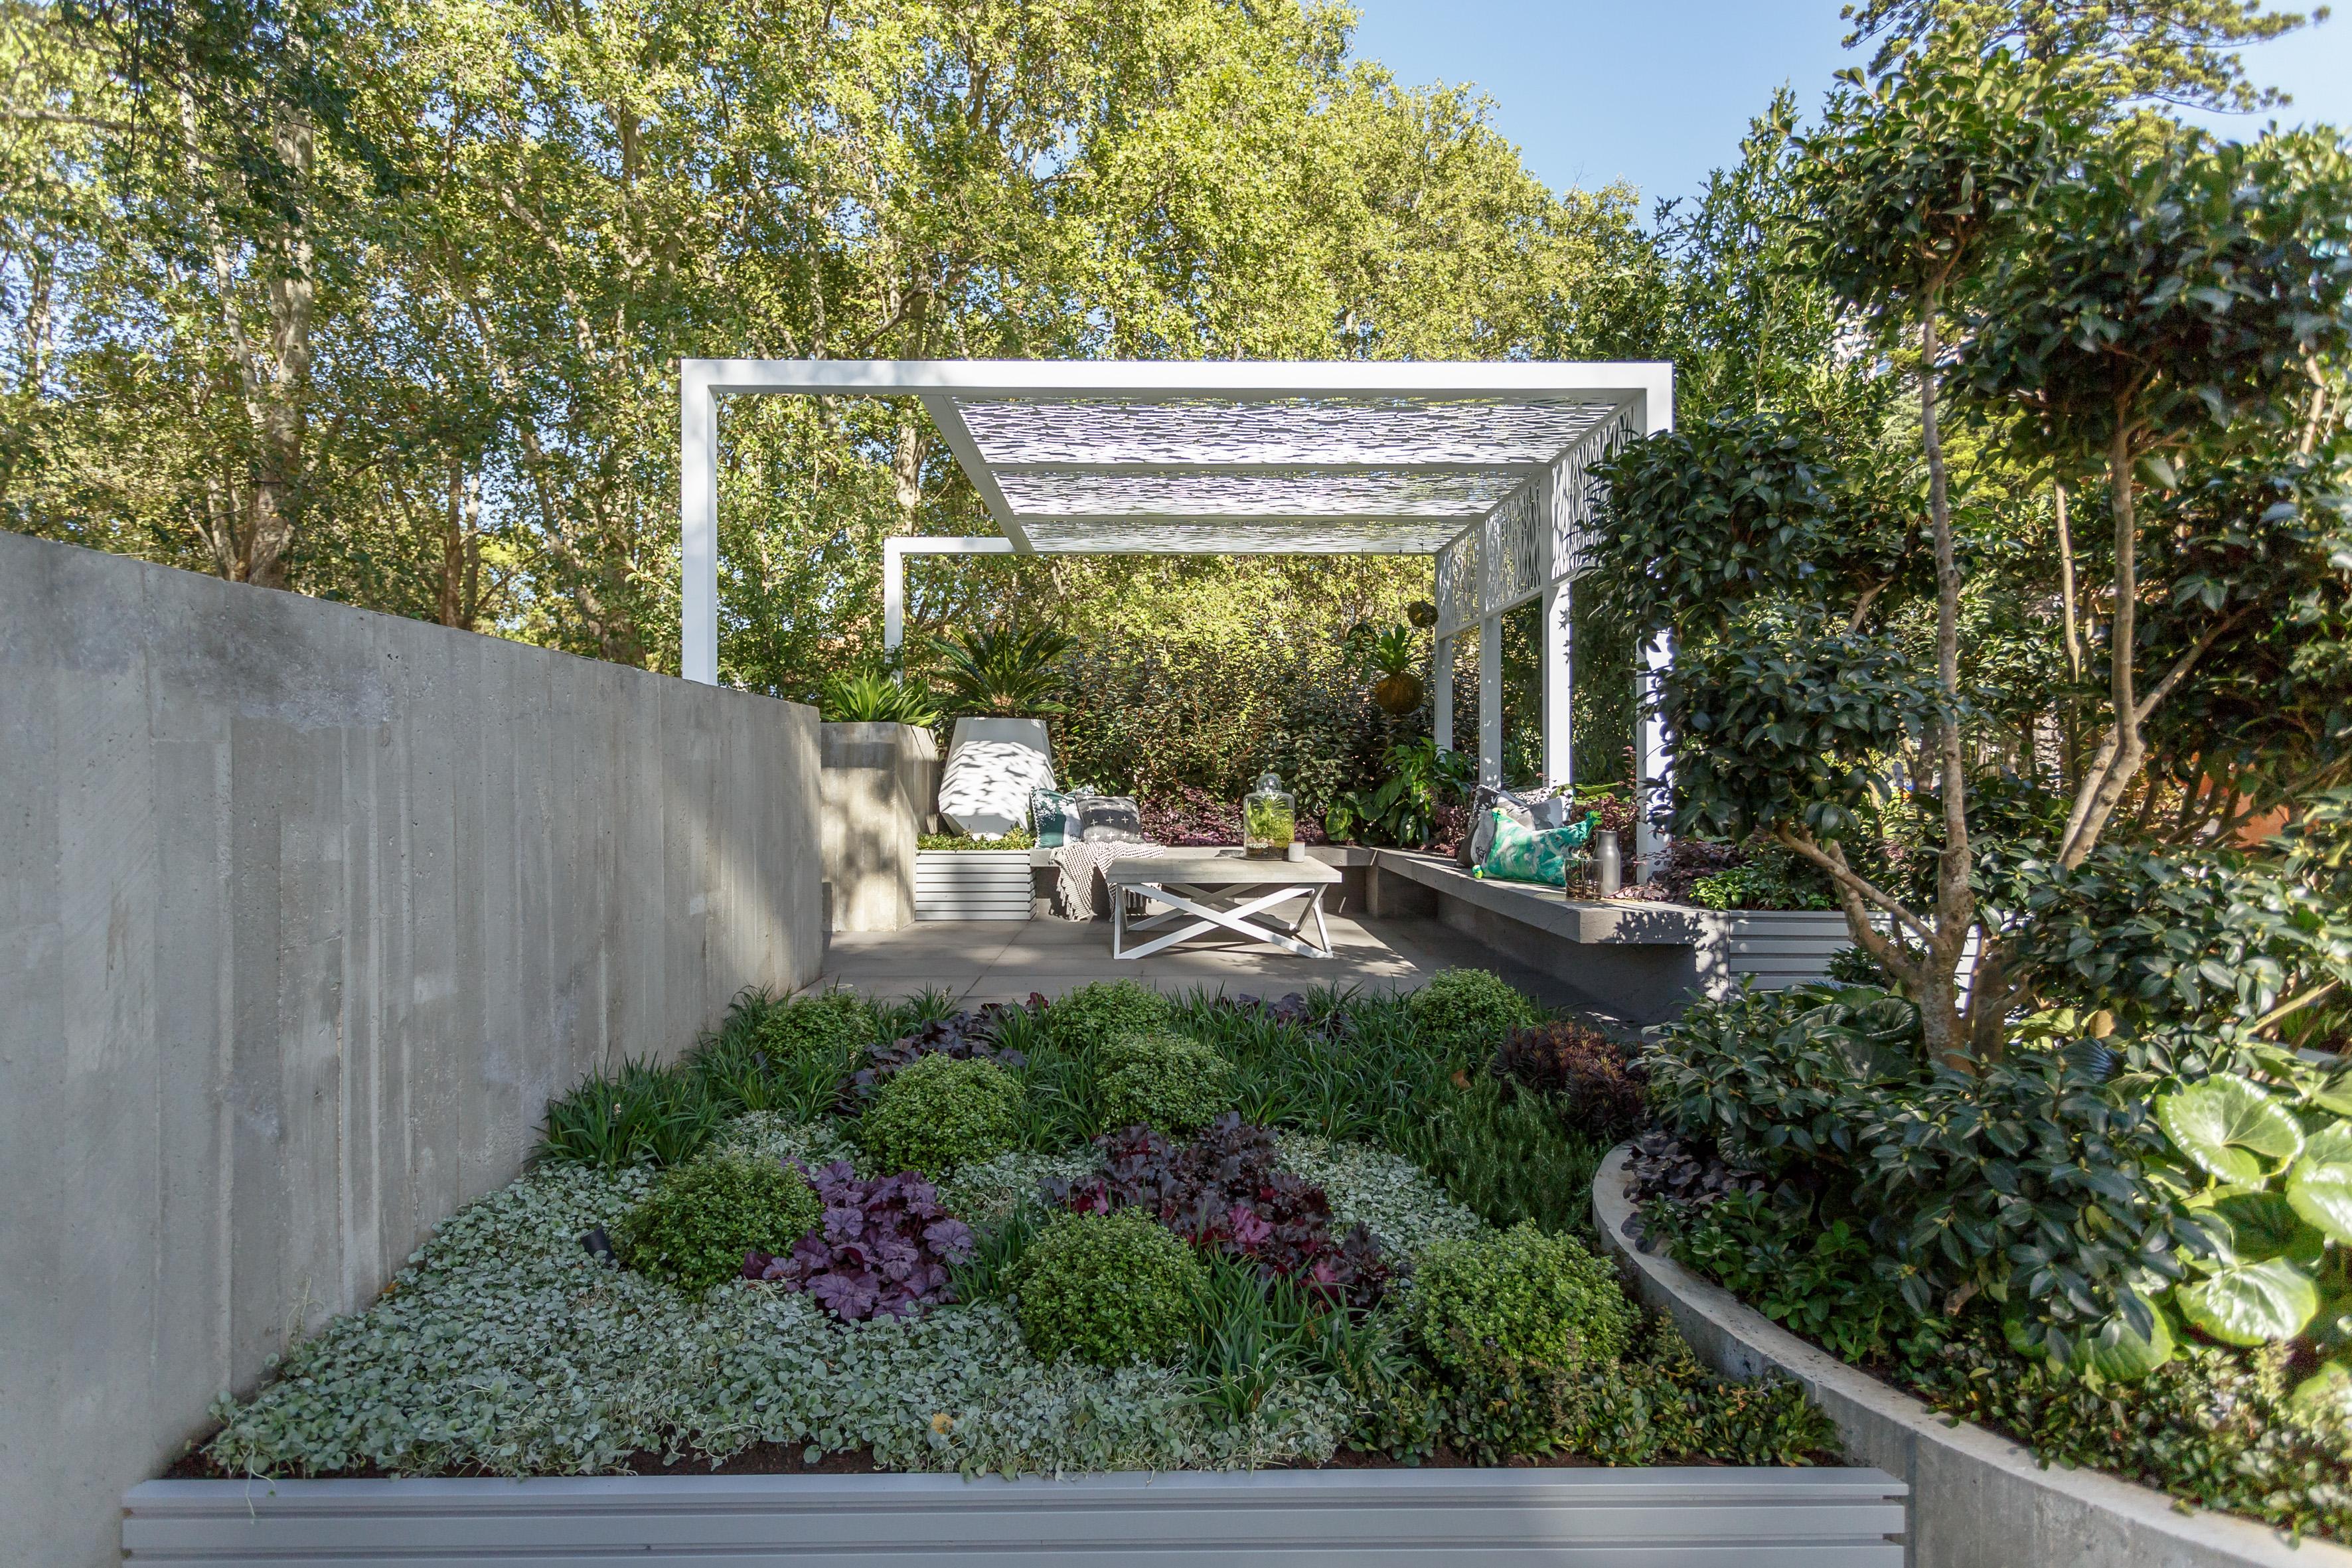 2017 melbourne international flower and garden show 39 s best gardens. Black Bedroom Furniture Sets. Home Design Ideas